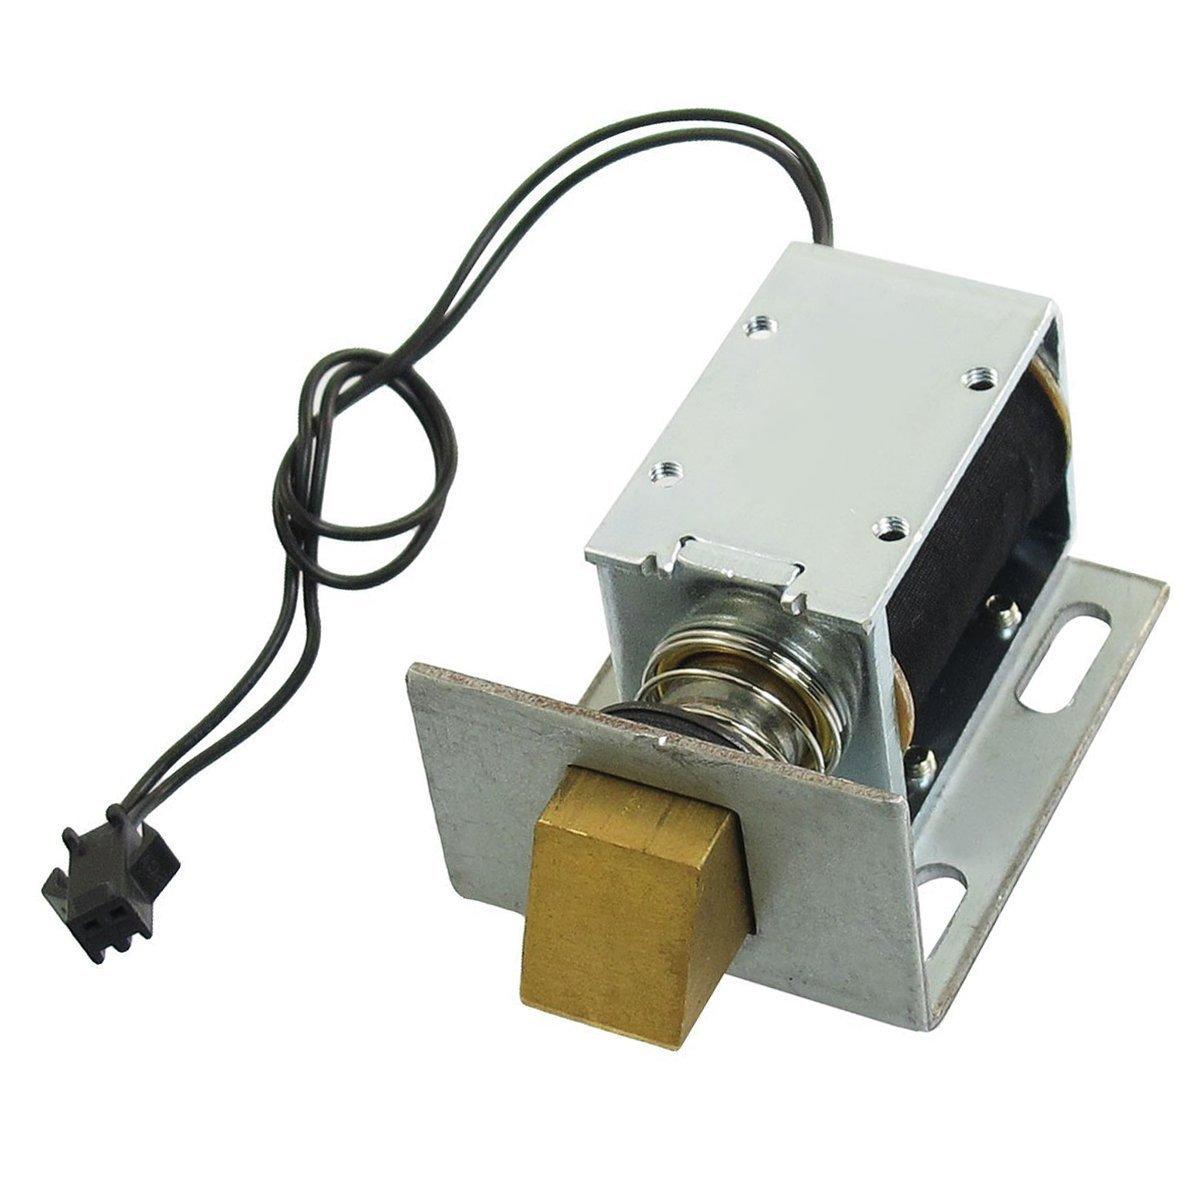 Saim Solenoid for Electric Door Lock, 1240L-12E07 DC 12V 20.6W , 1kg Holding YPP170118001